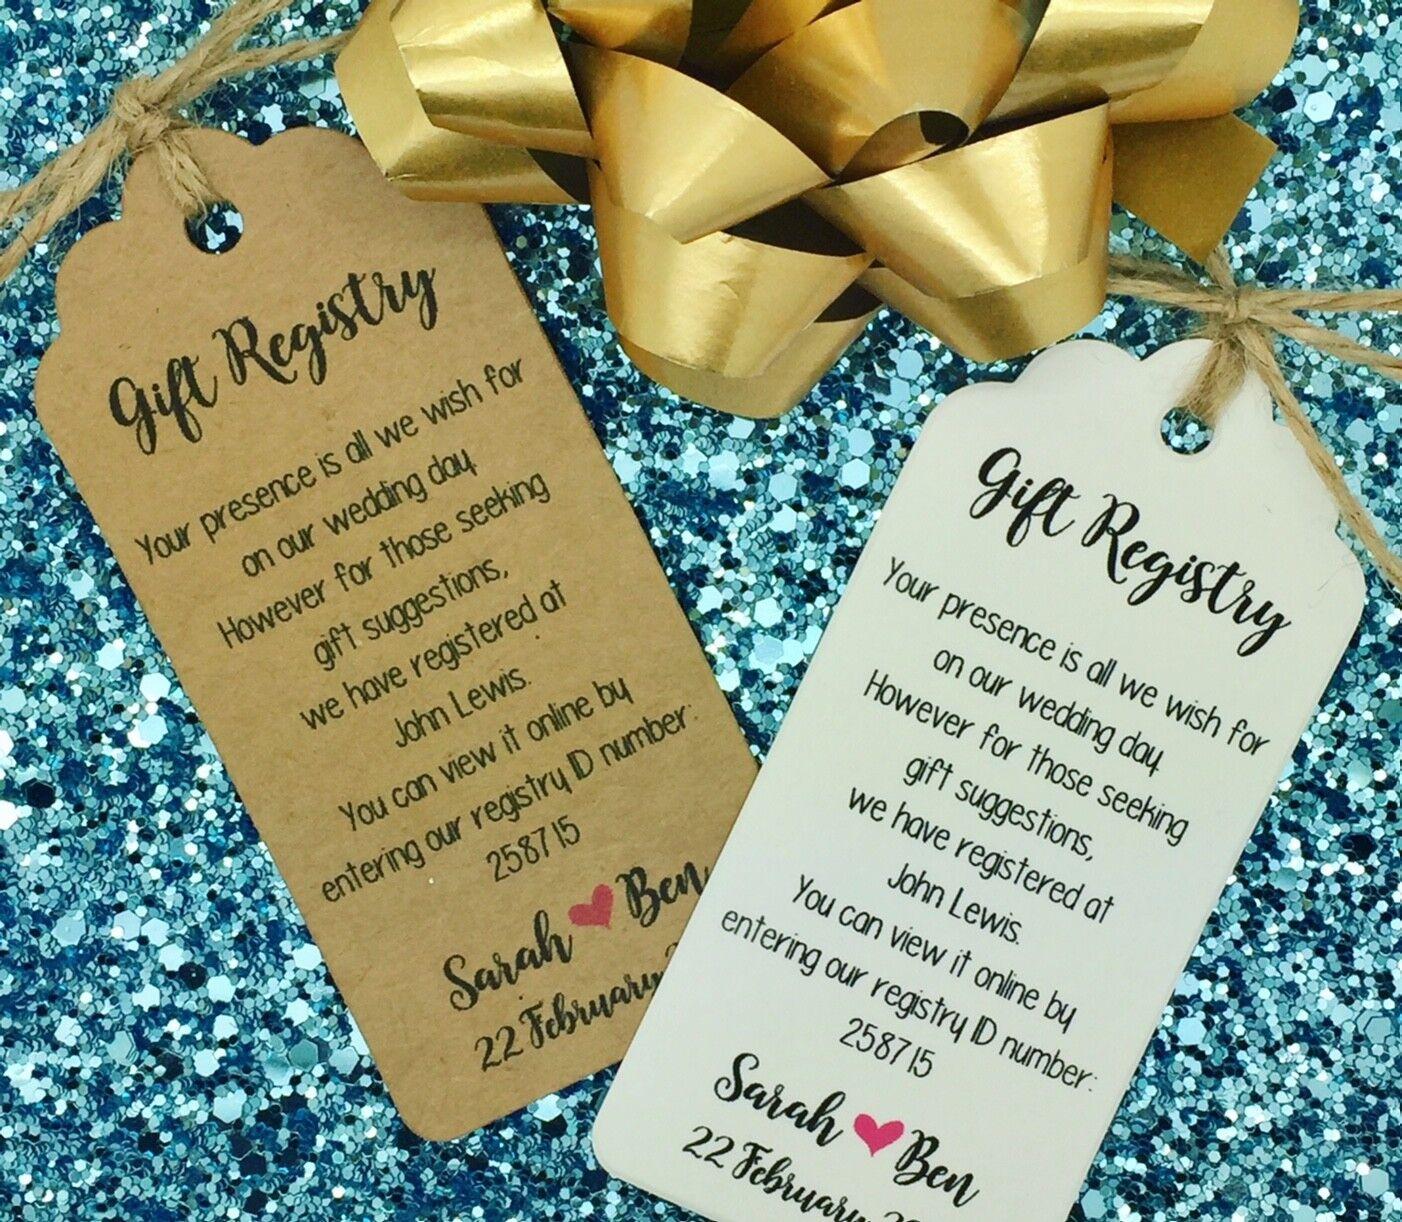 Wedding Gift Registry, Wishing well Card, Money Request Poem Card